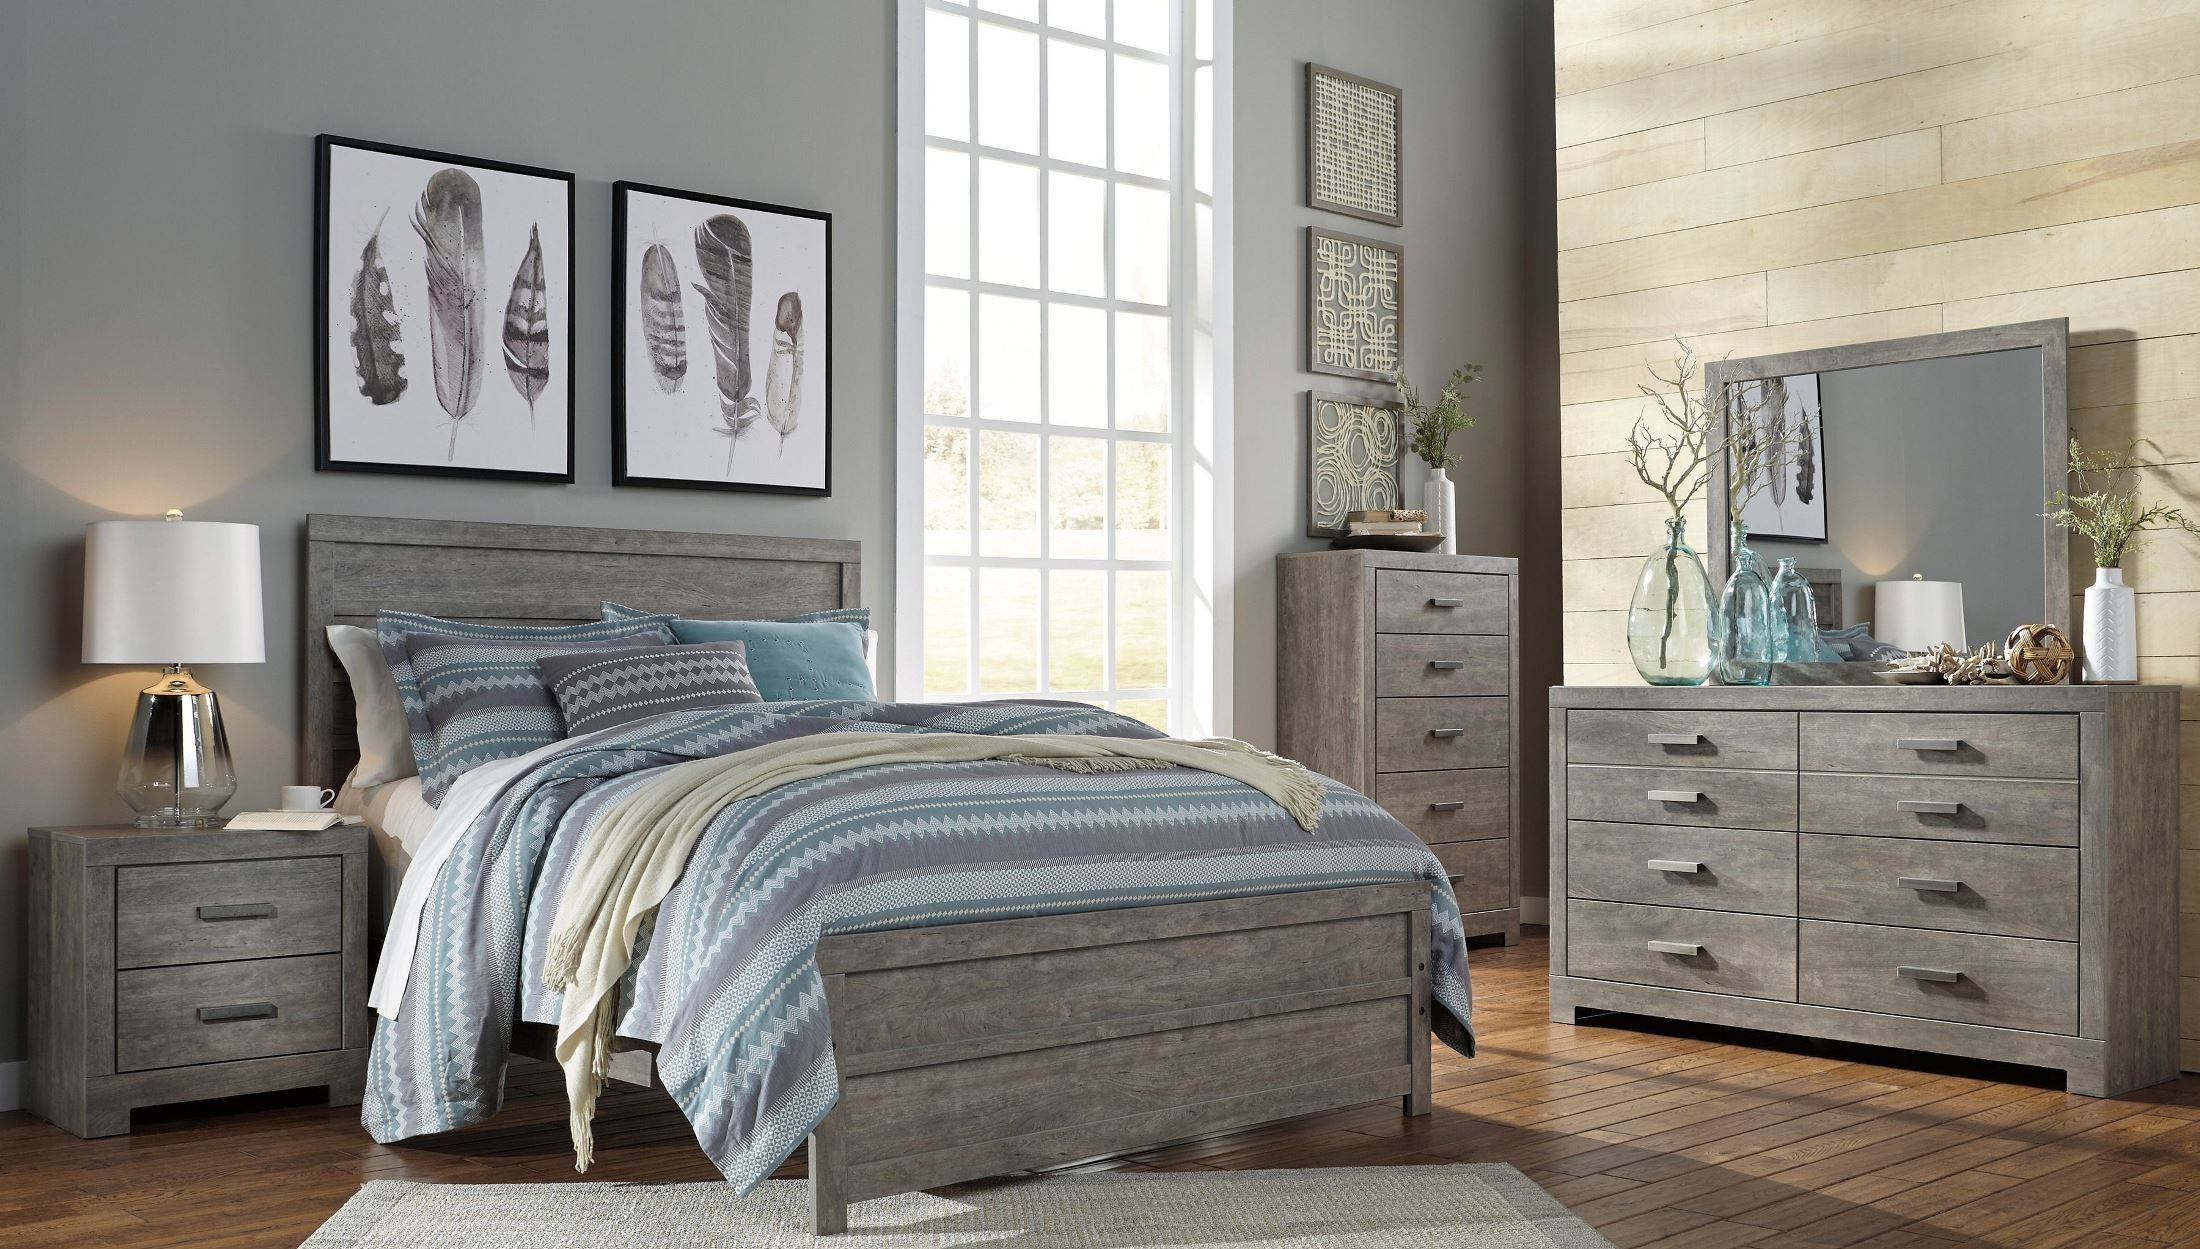 culverbach panel bedroom set b070 57 54 96 ashley. Black Bedroom Furniture Sets. Home Design Ideas